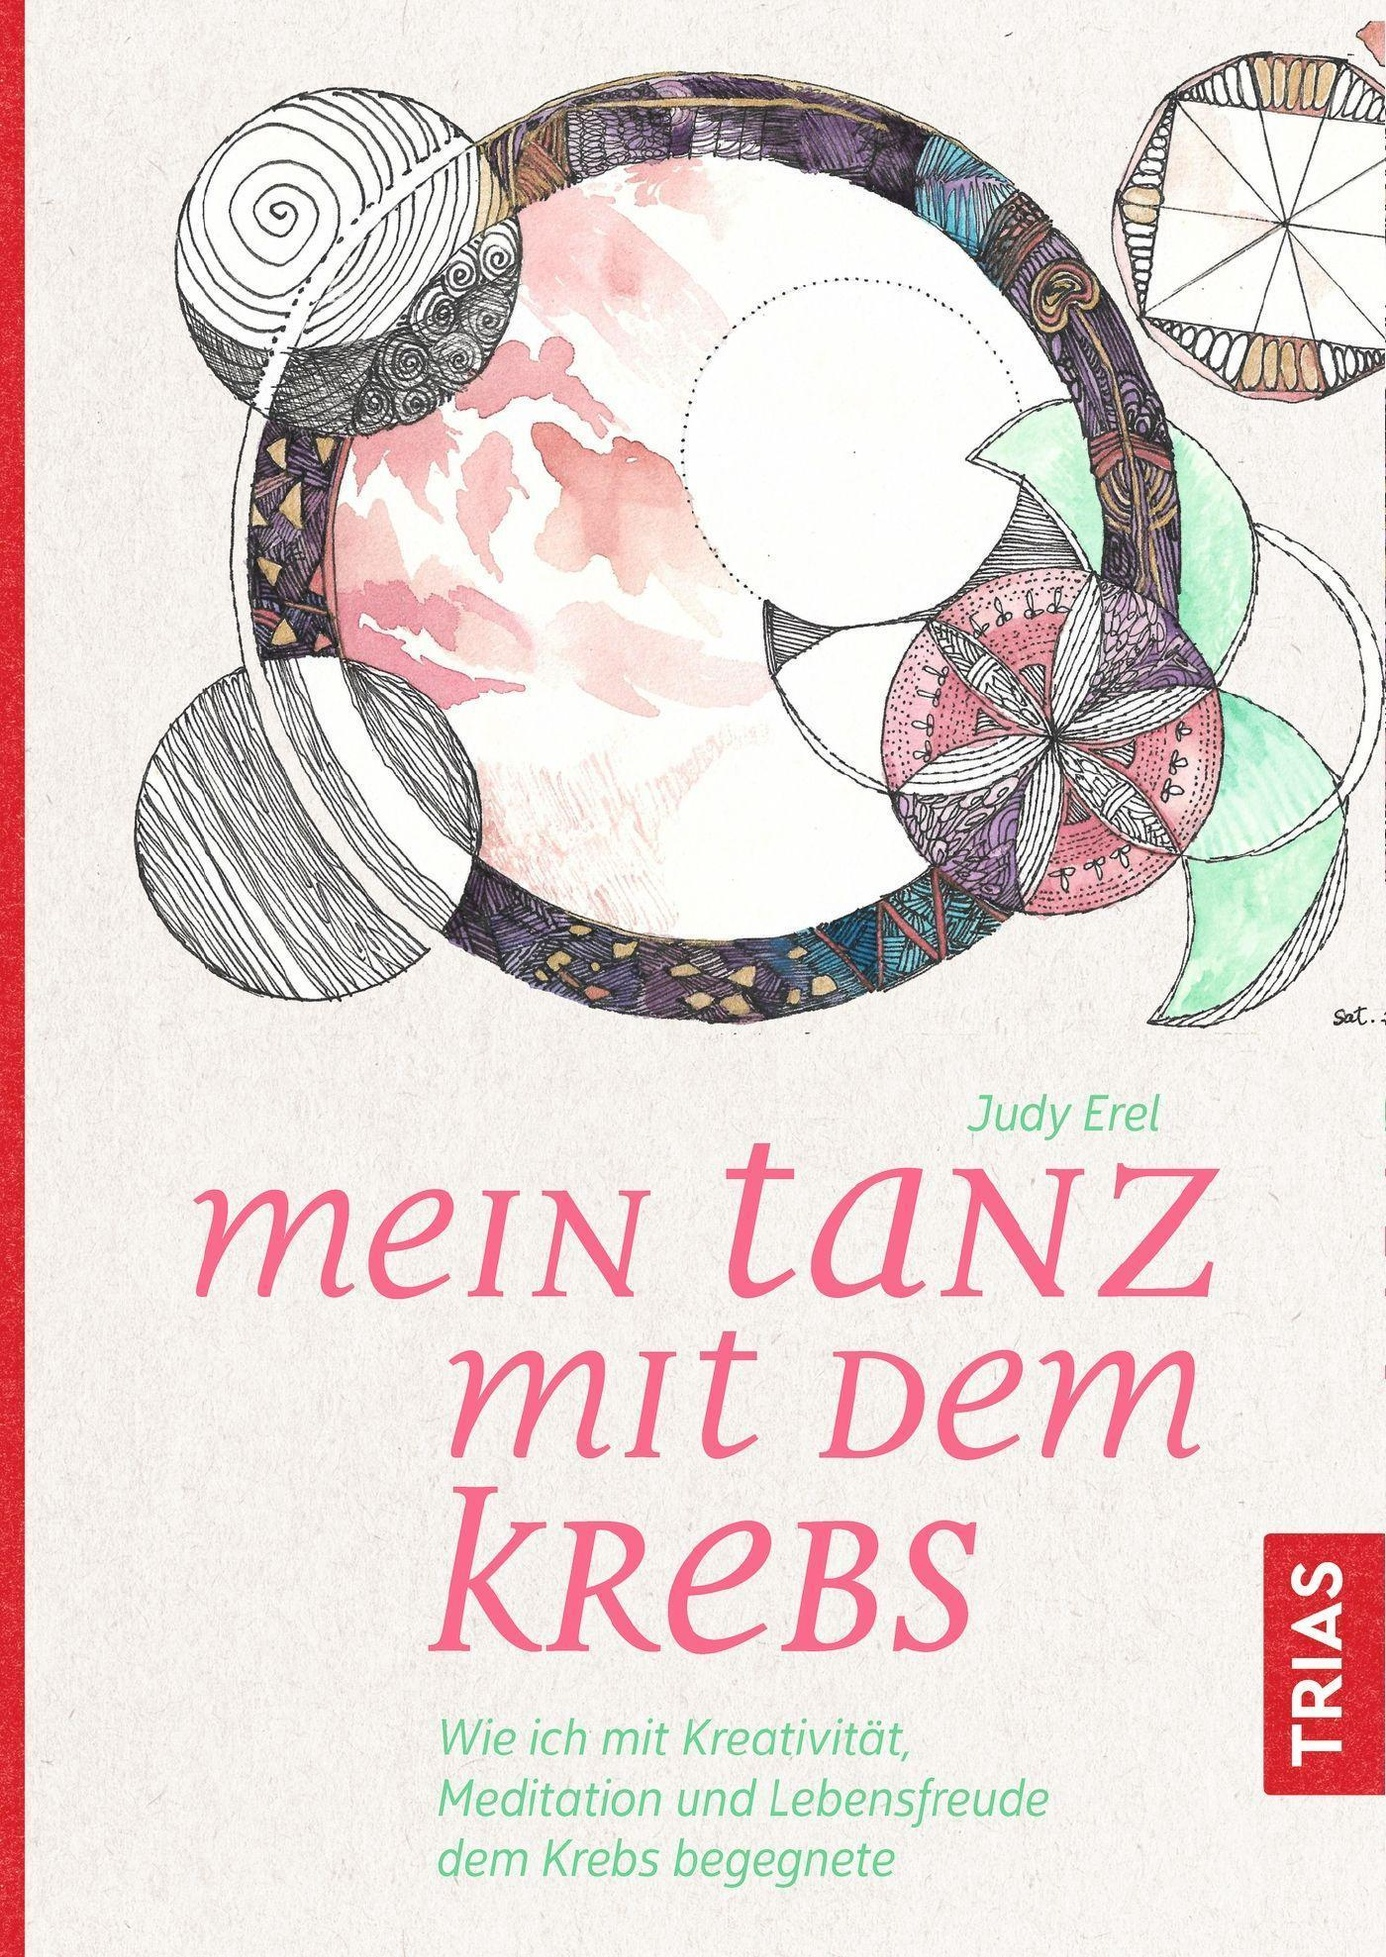 Weinitzen frau single - Sankt florian blitz dating